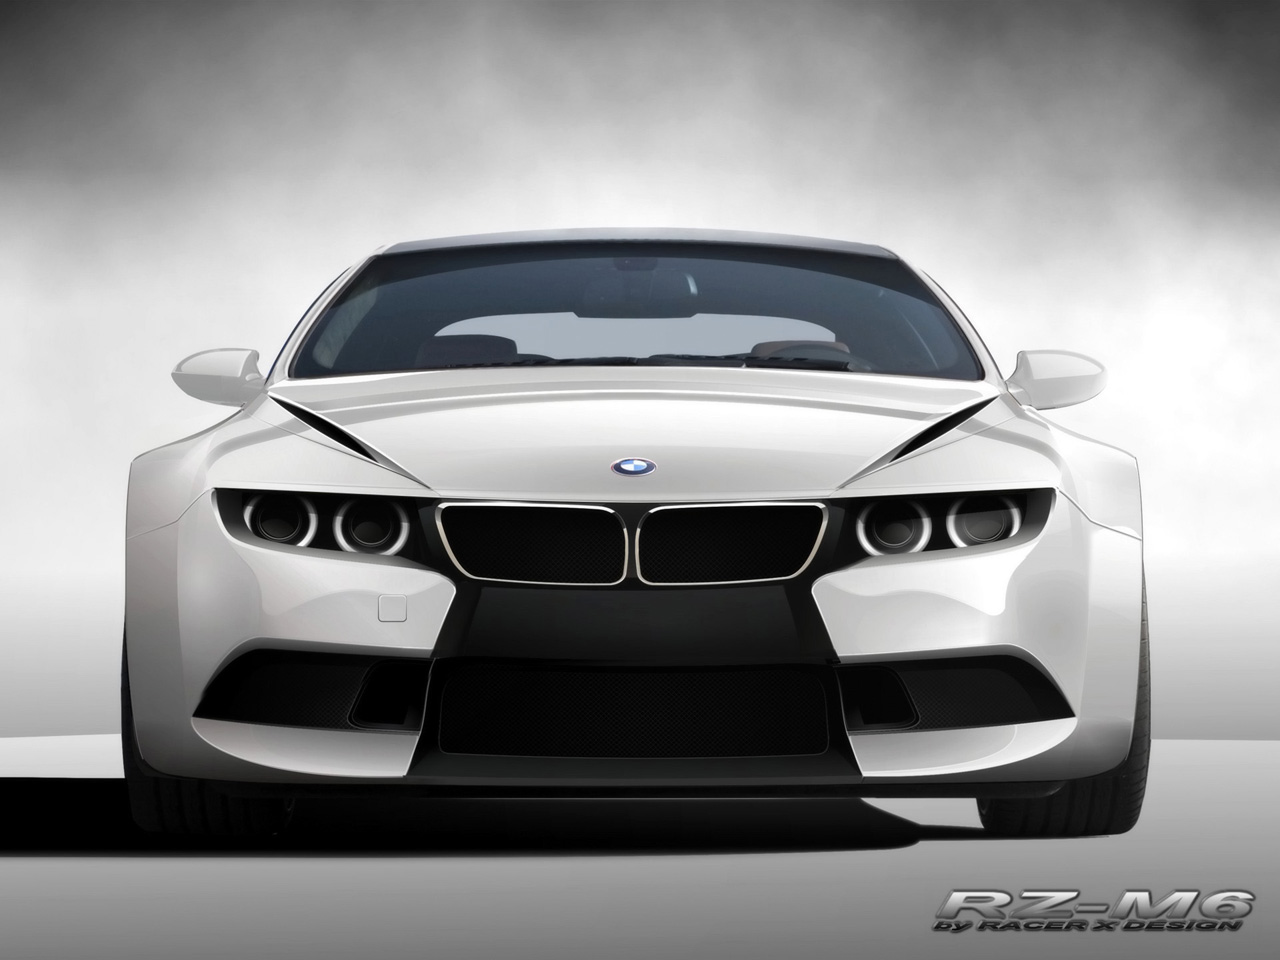 http://1.bp.blogspot.com/-QD3mSEJjBSg/Tib5sUS-4aI/AAAAAAAAIGY/V1xFkKIyaWM/s1600/BMW+RZ-M6+by+Racer+X+Design+Wallpapers+1.jpg